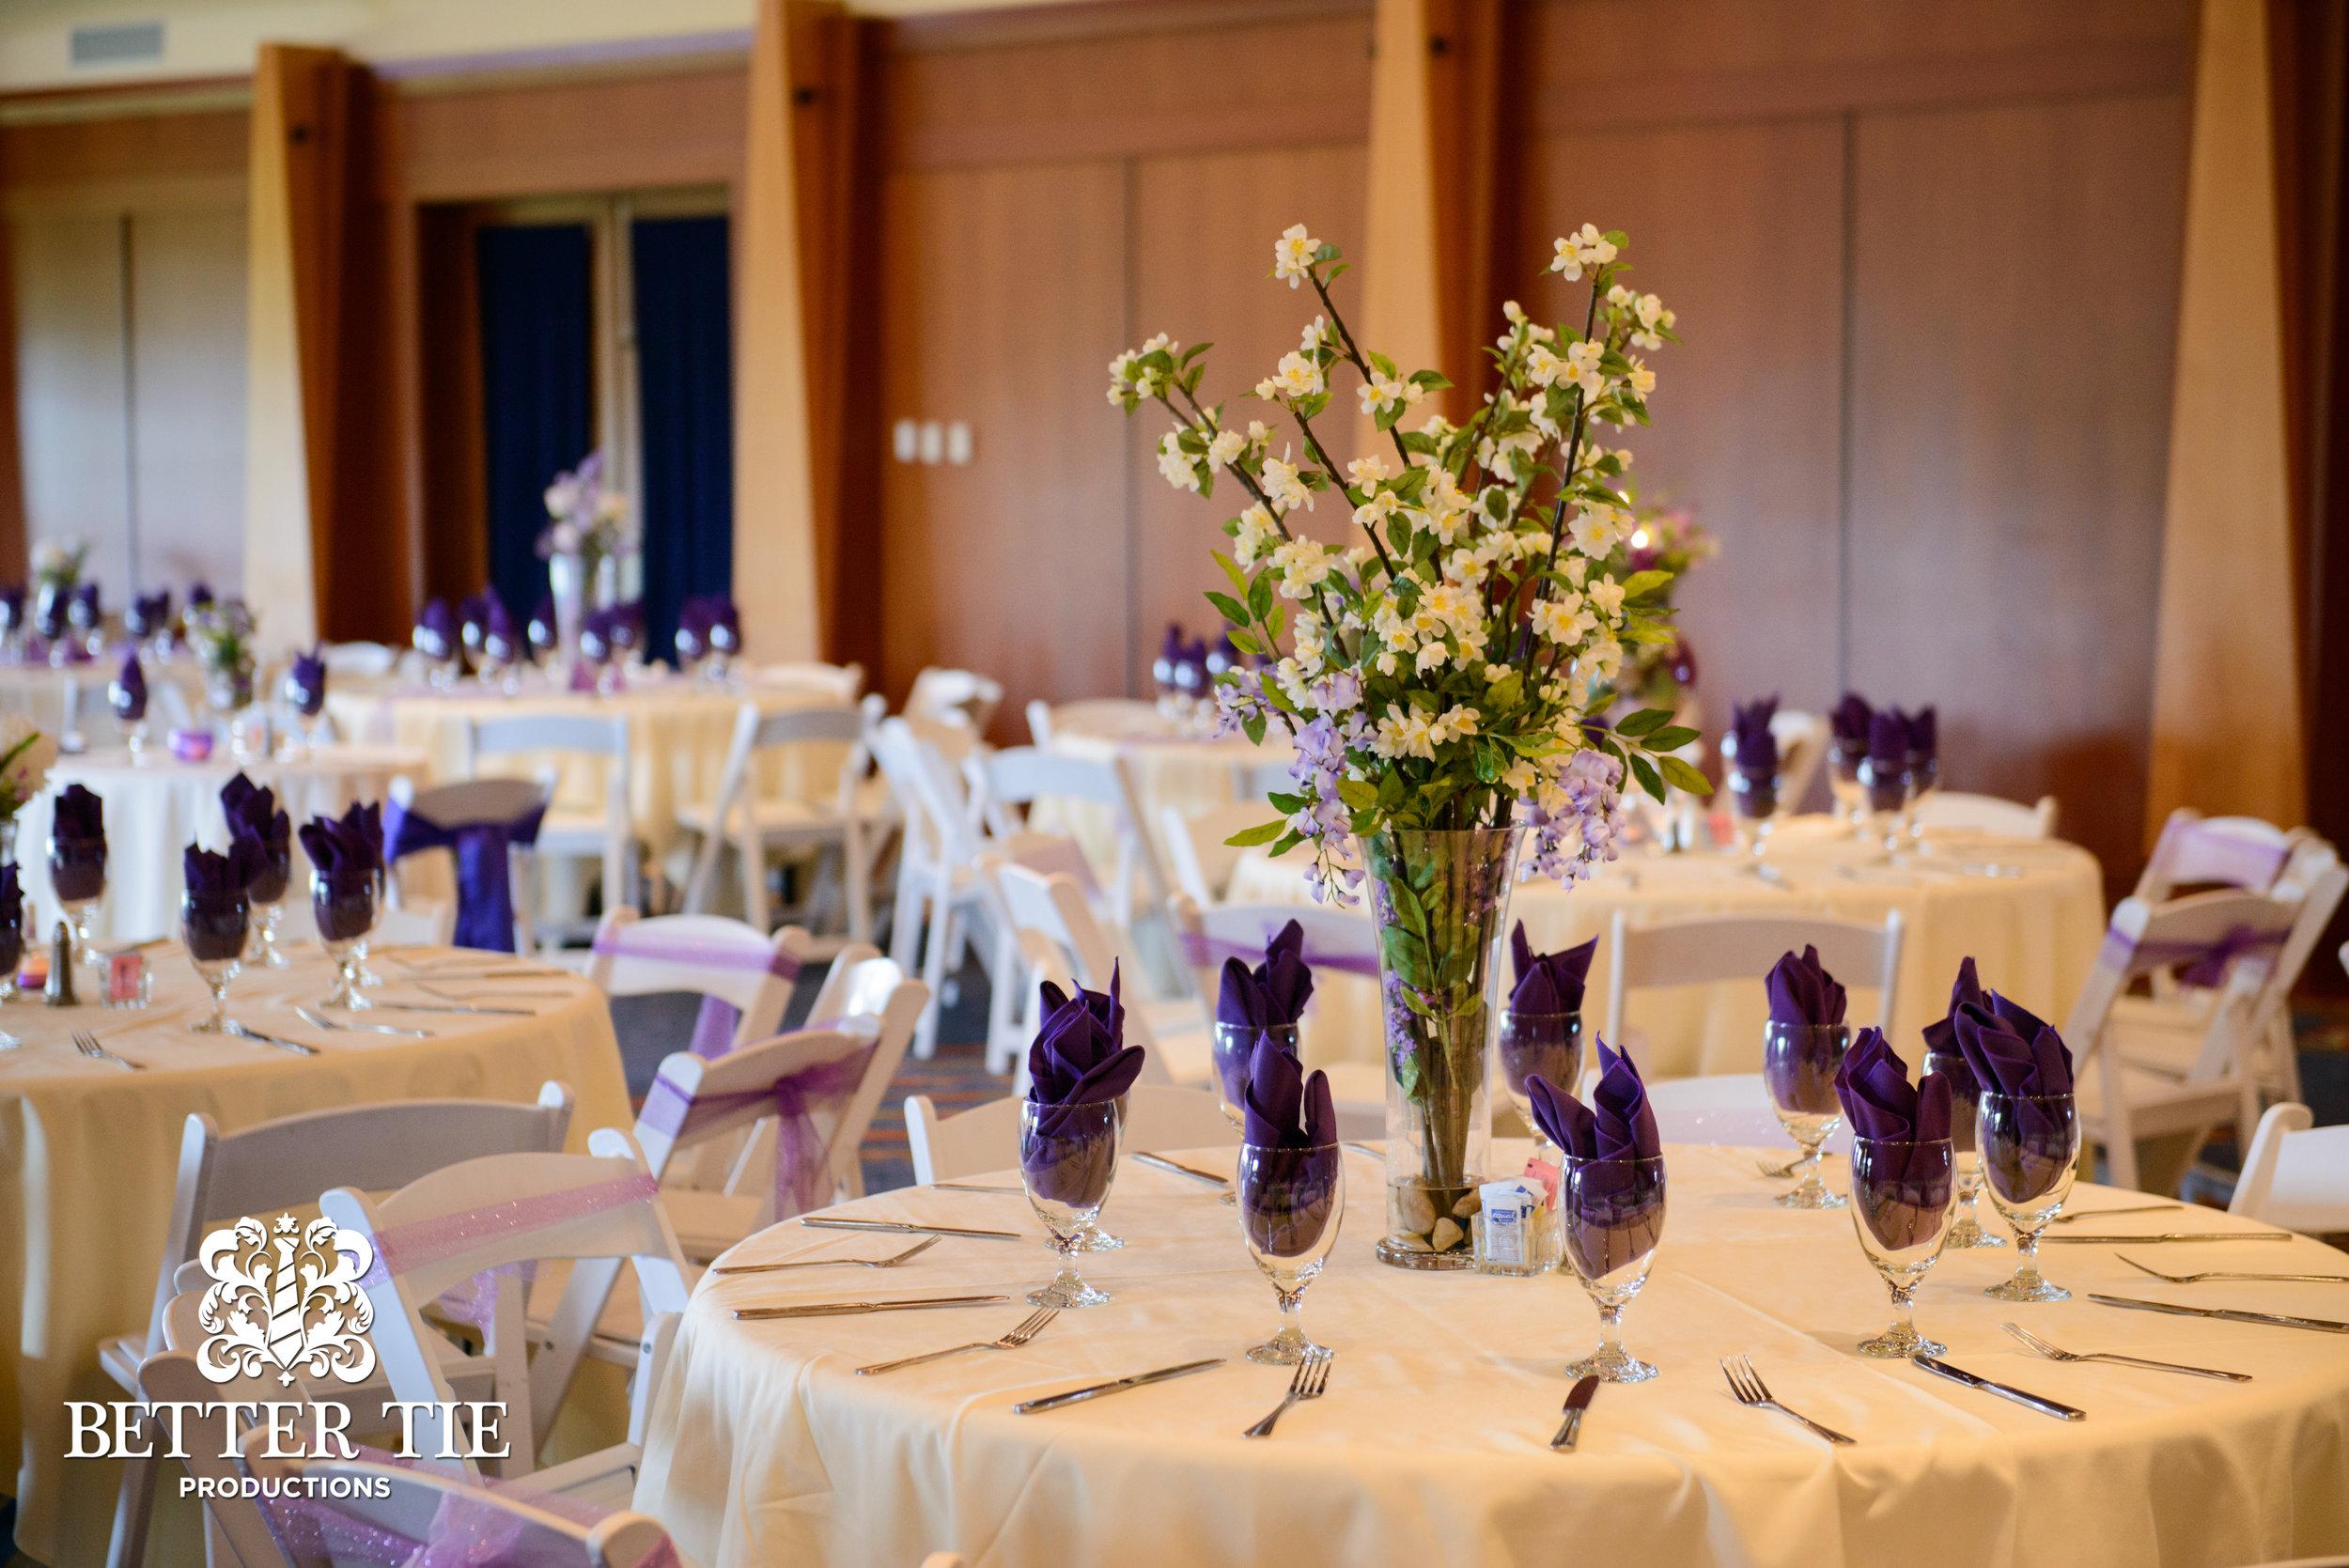 cateechee-golf-club-wedding-4.jpg